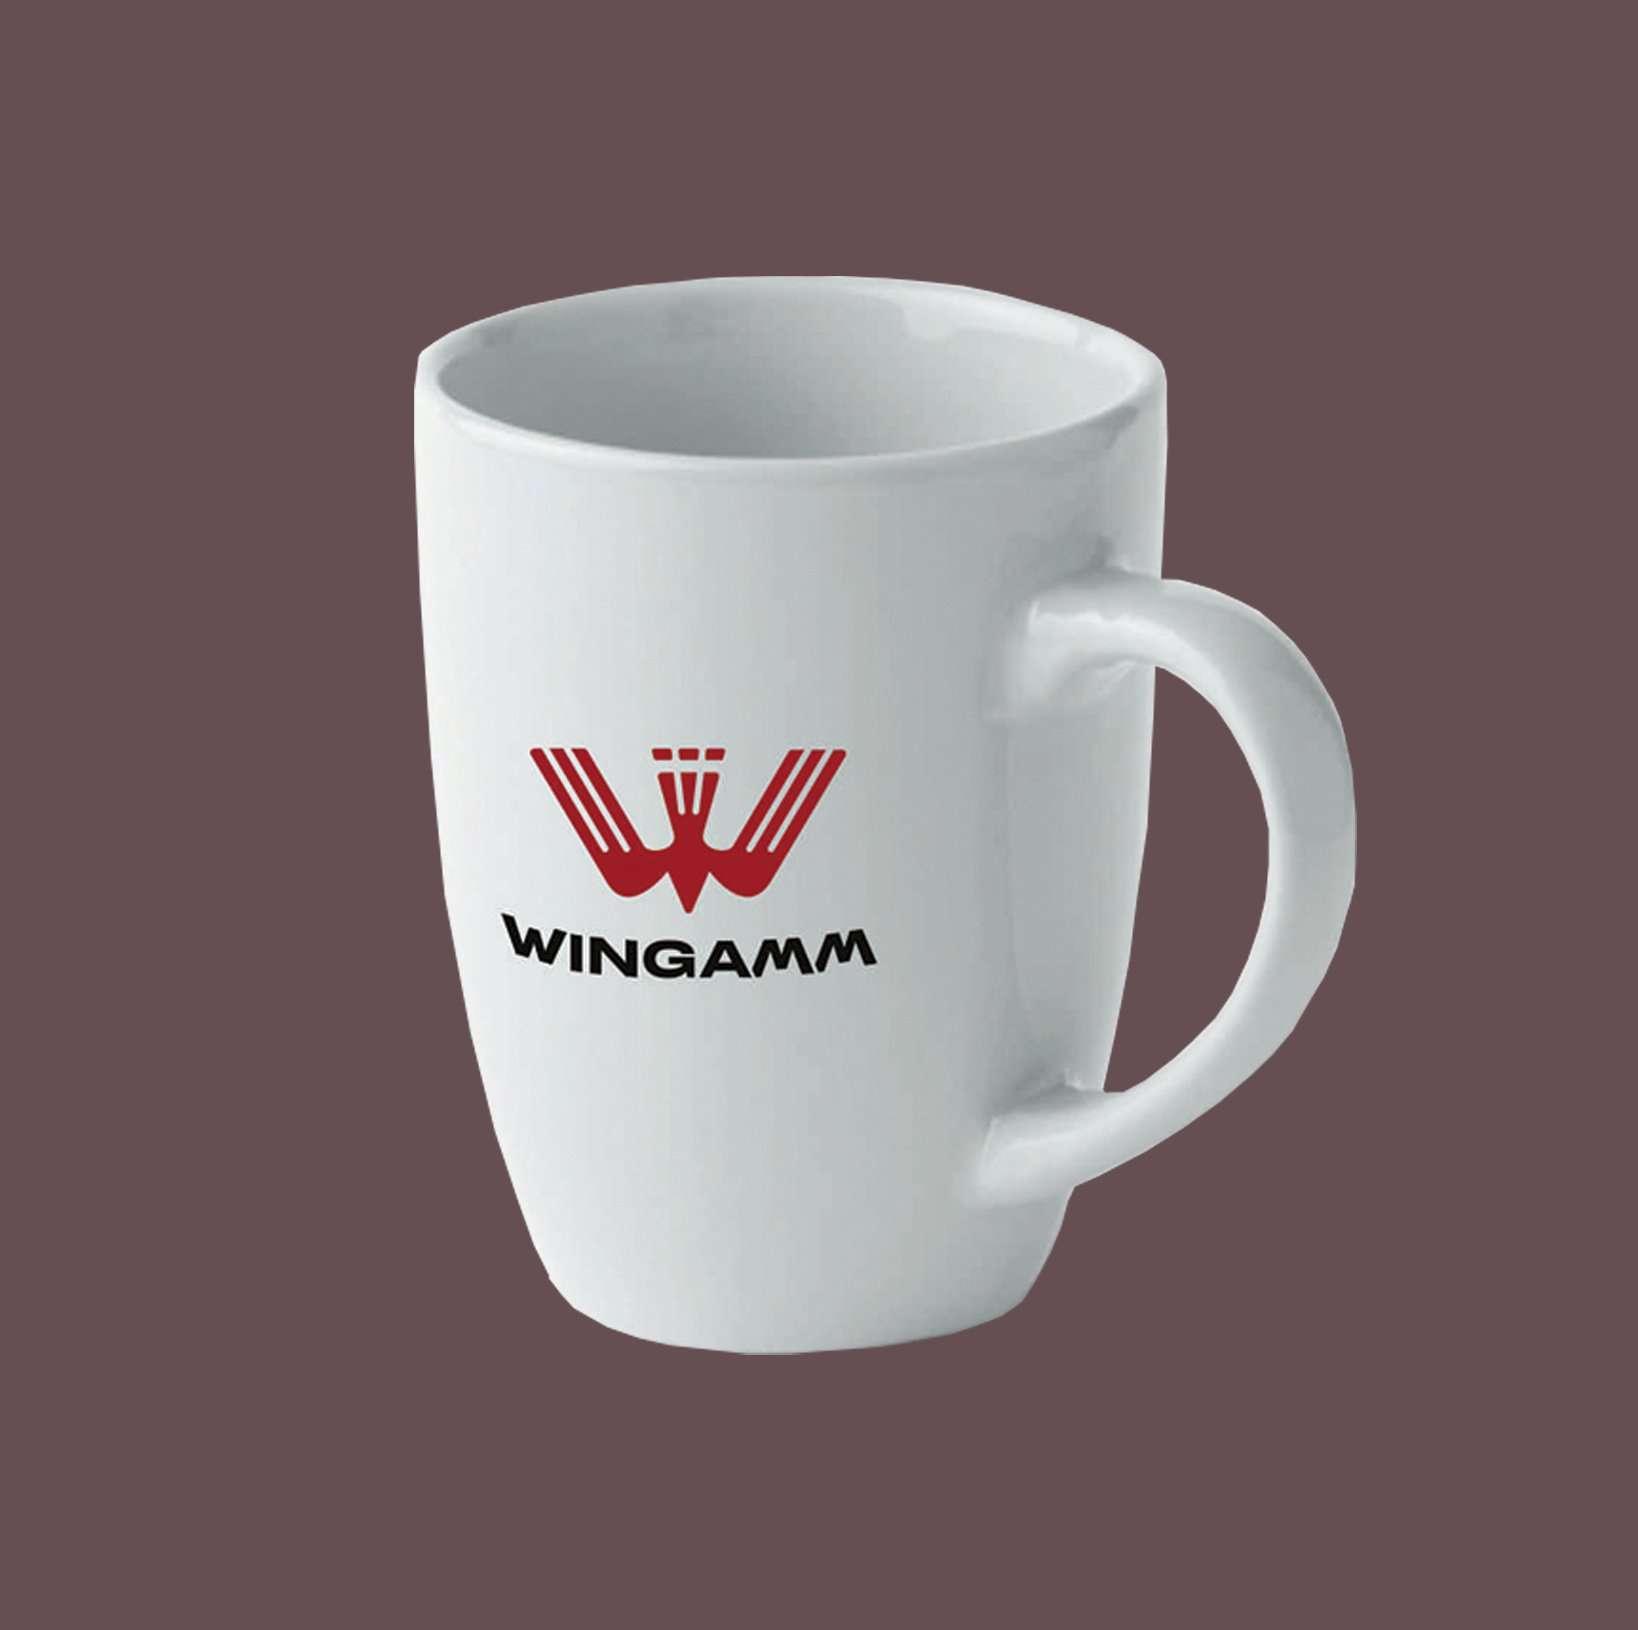 Mug Wingamm - camper